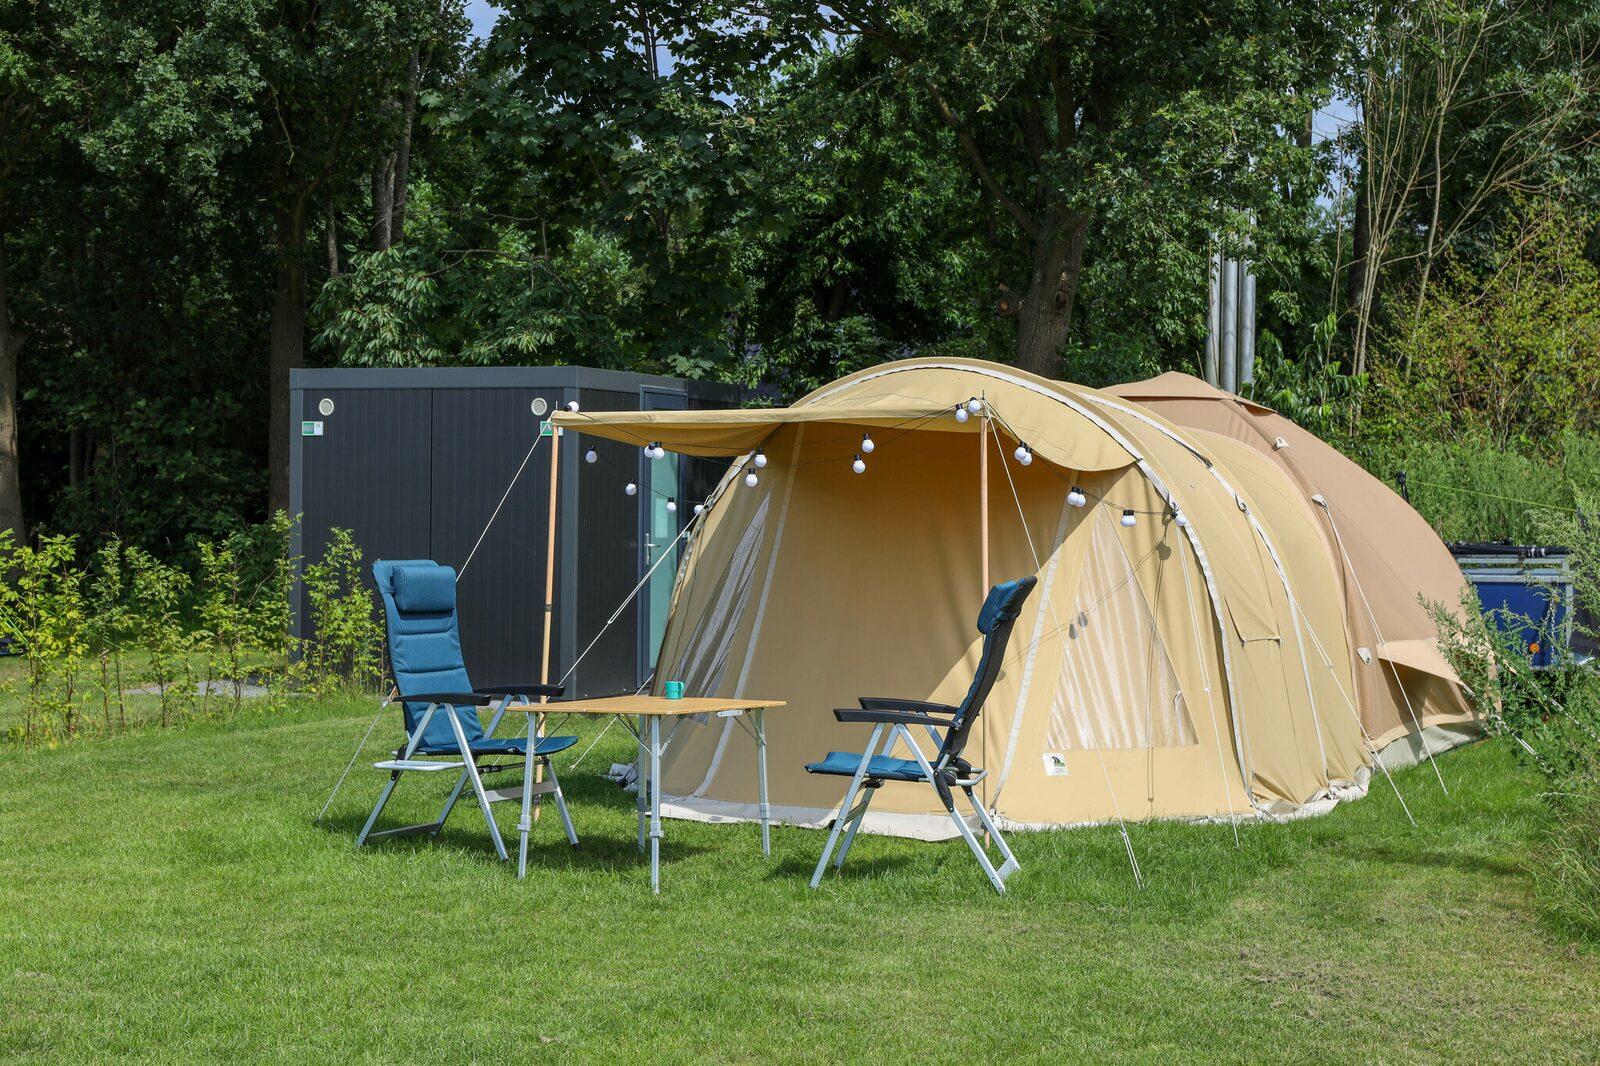 Campingplatz mit eigenem Sanitärgebäude